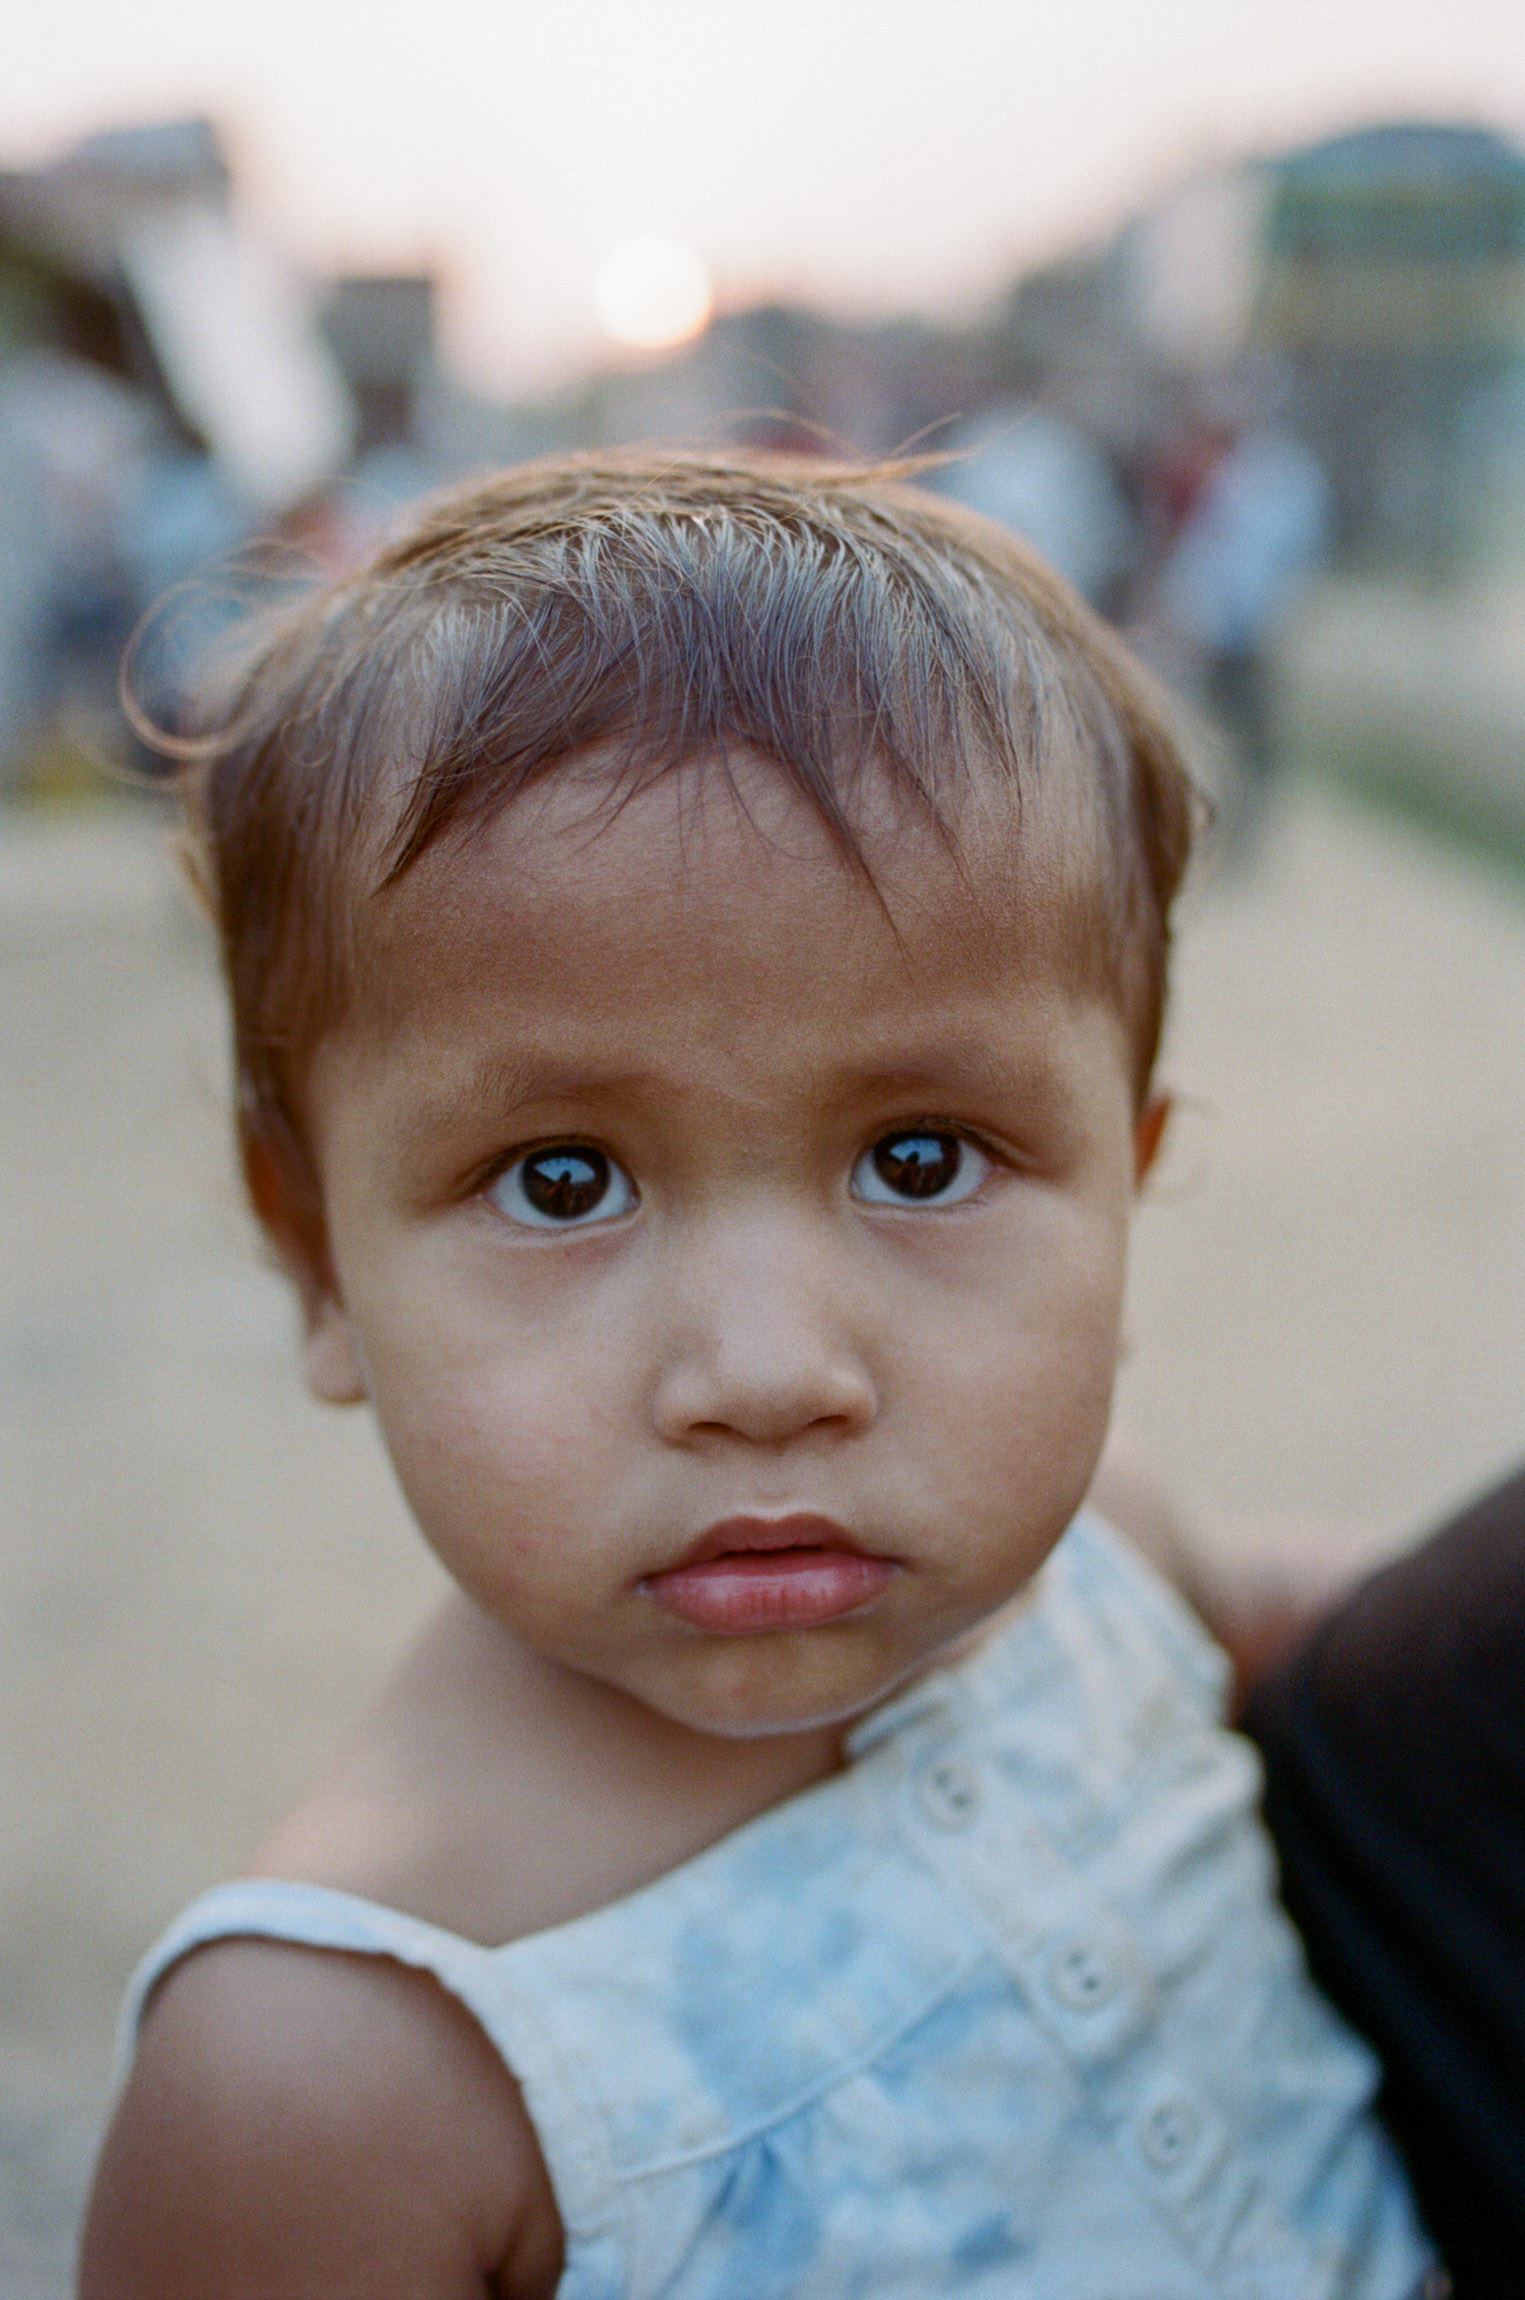 21392_JRE_Nepal_002-33site.jpg